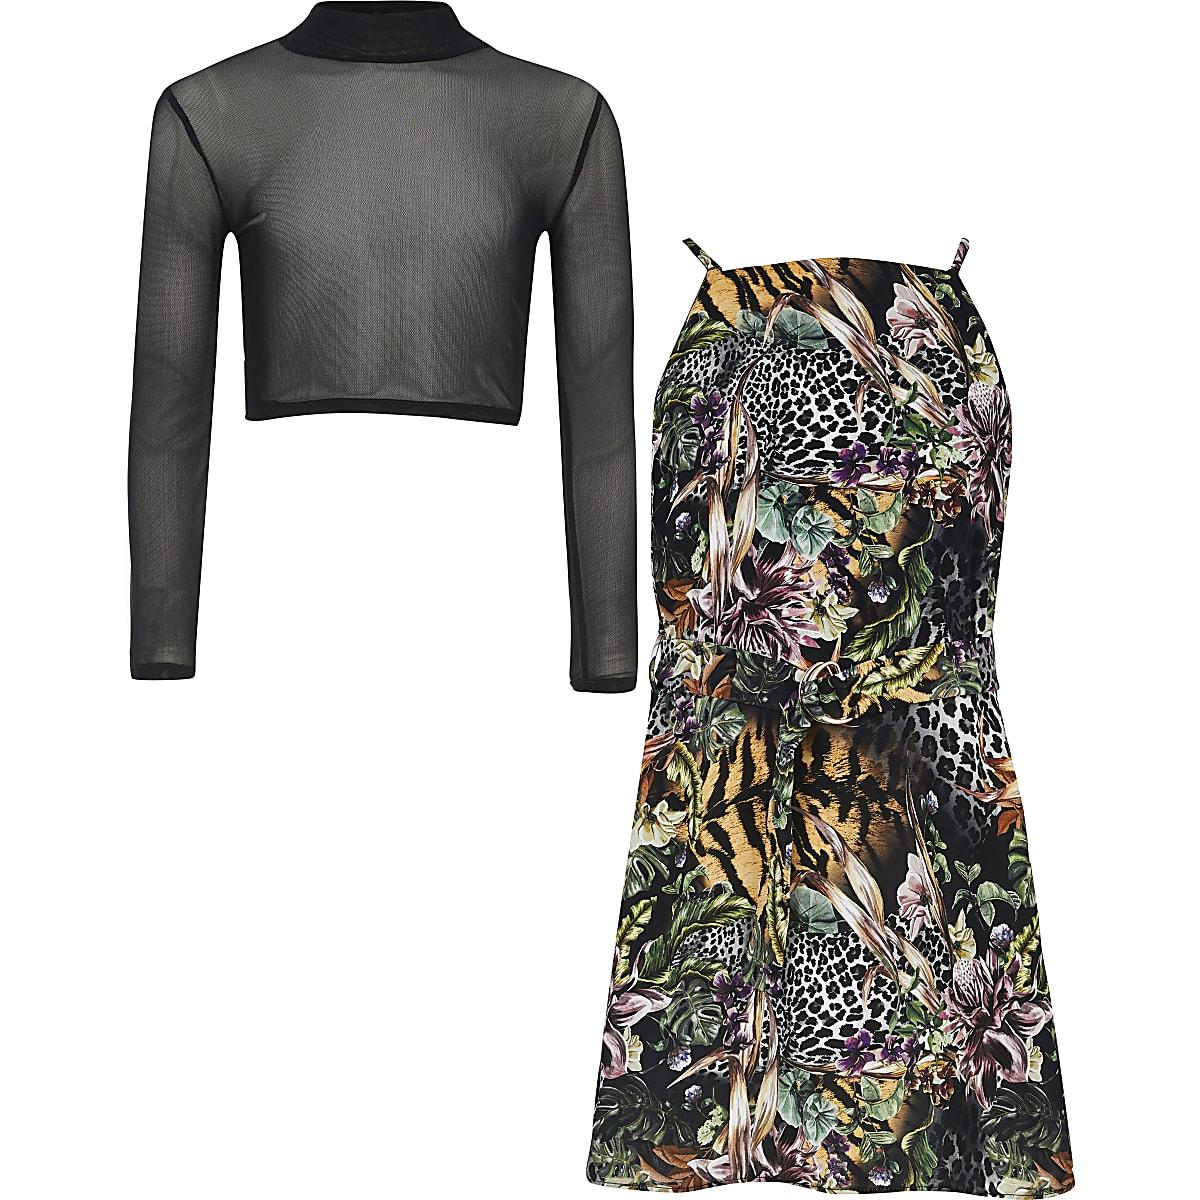 Zwarte 2-in-1 hoogsluitende jurk met print voor meisjes